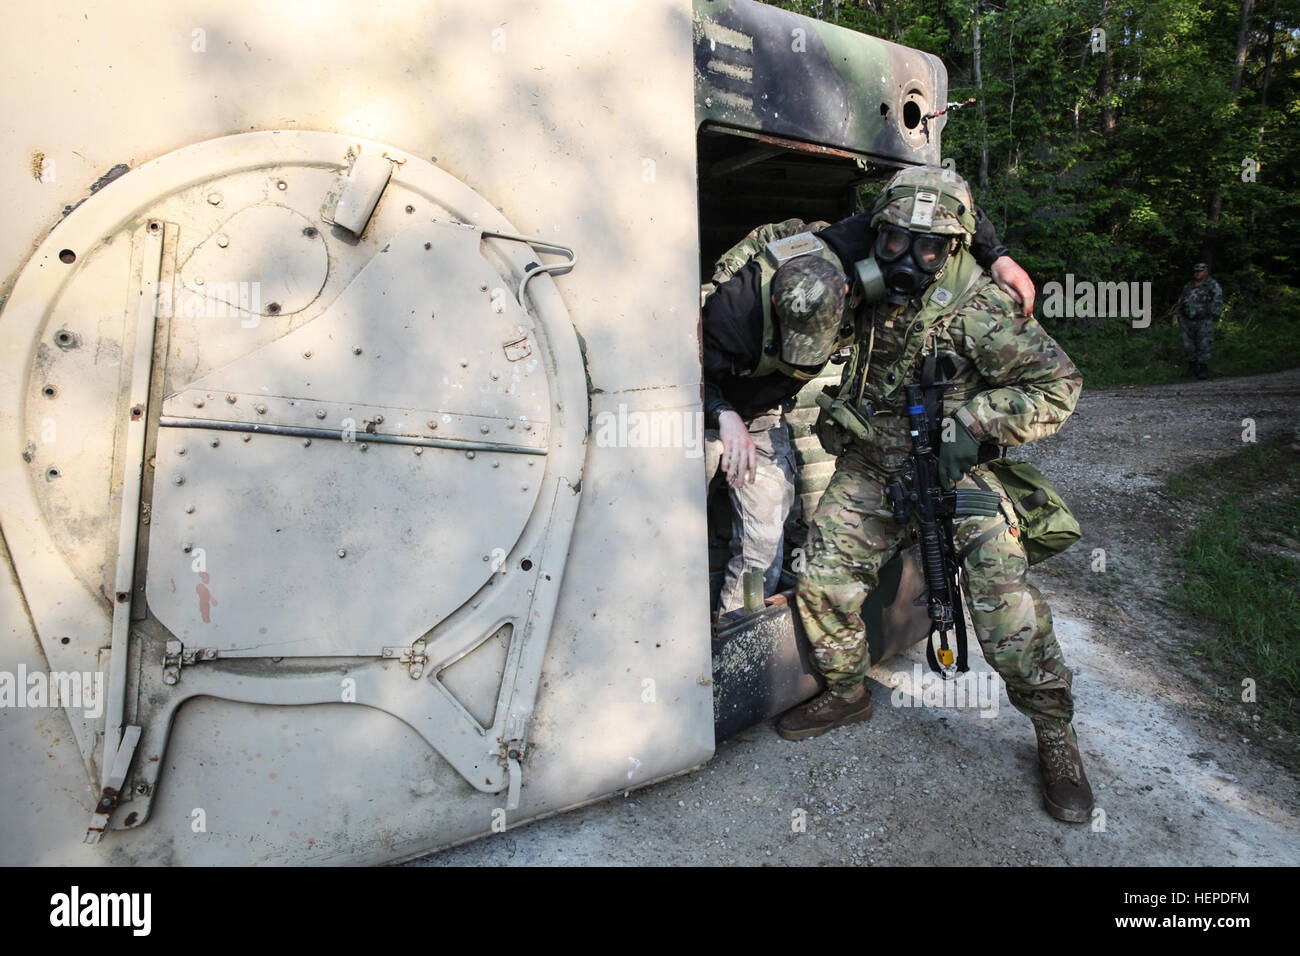 Berühmt Uns Armee Militär Lebenslauf Fotos - Entry Level Resume ...